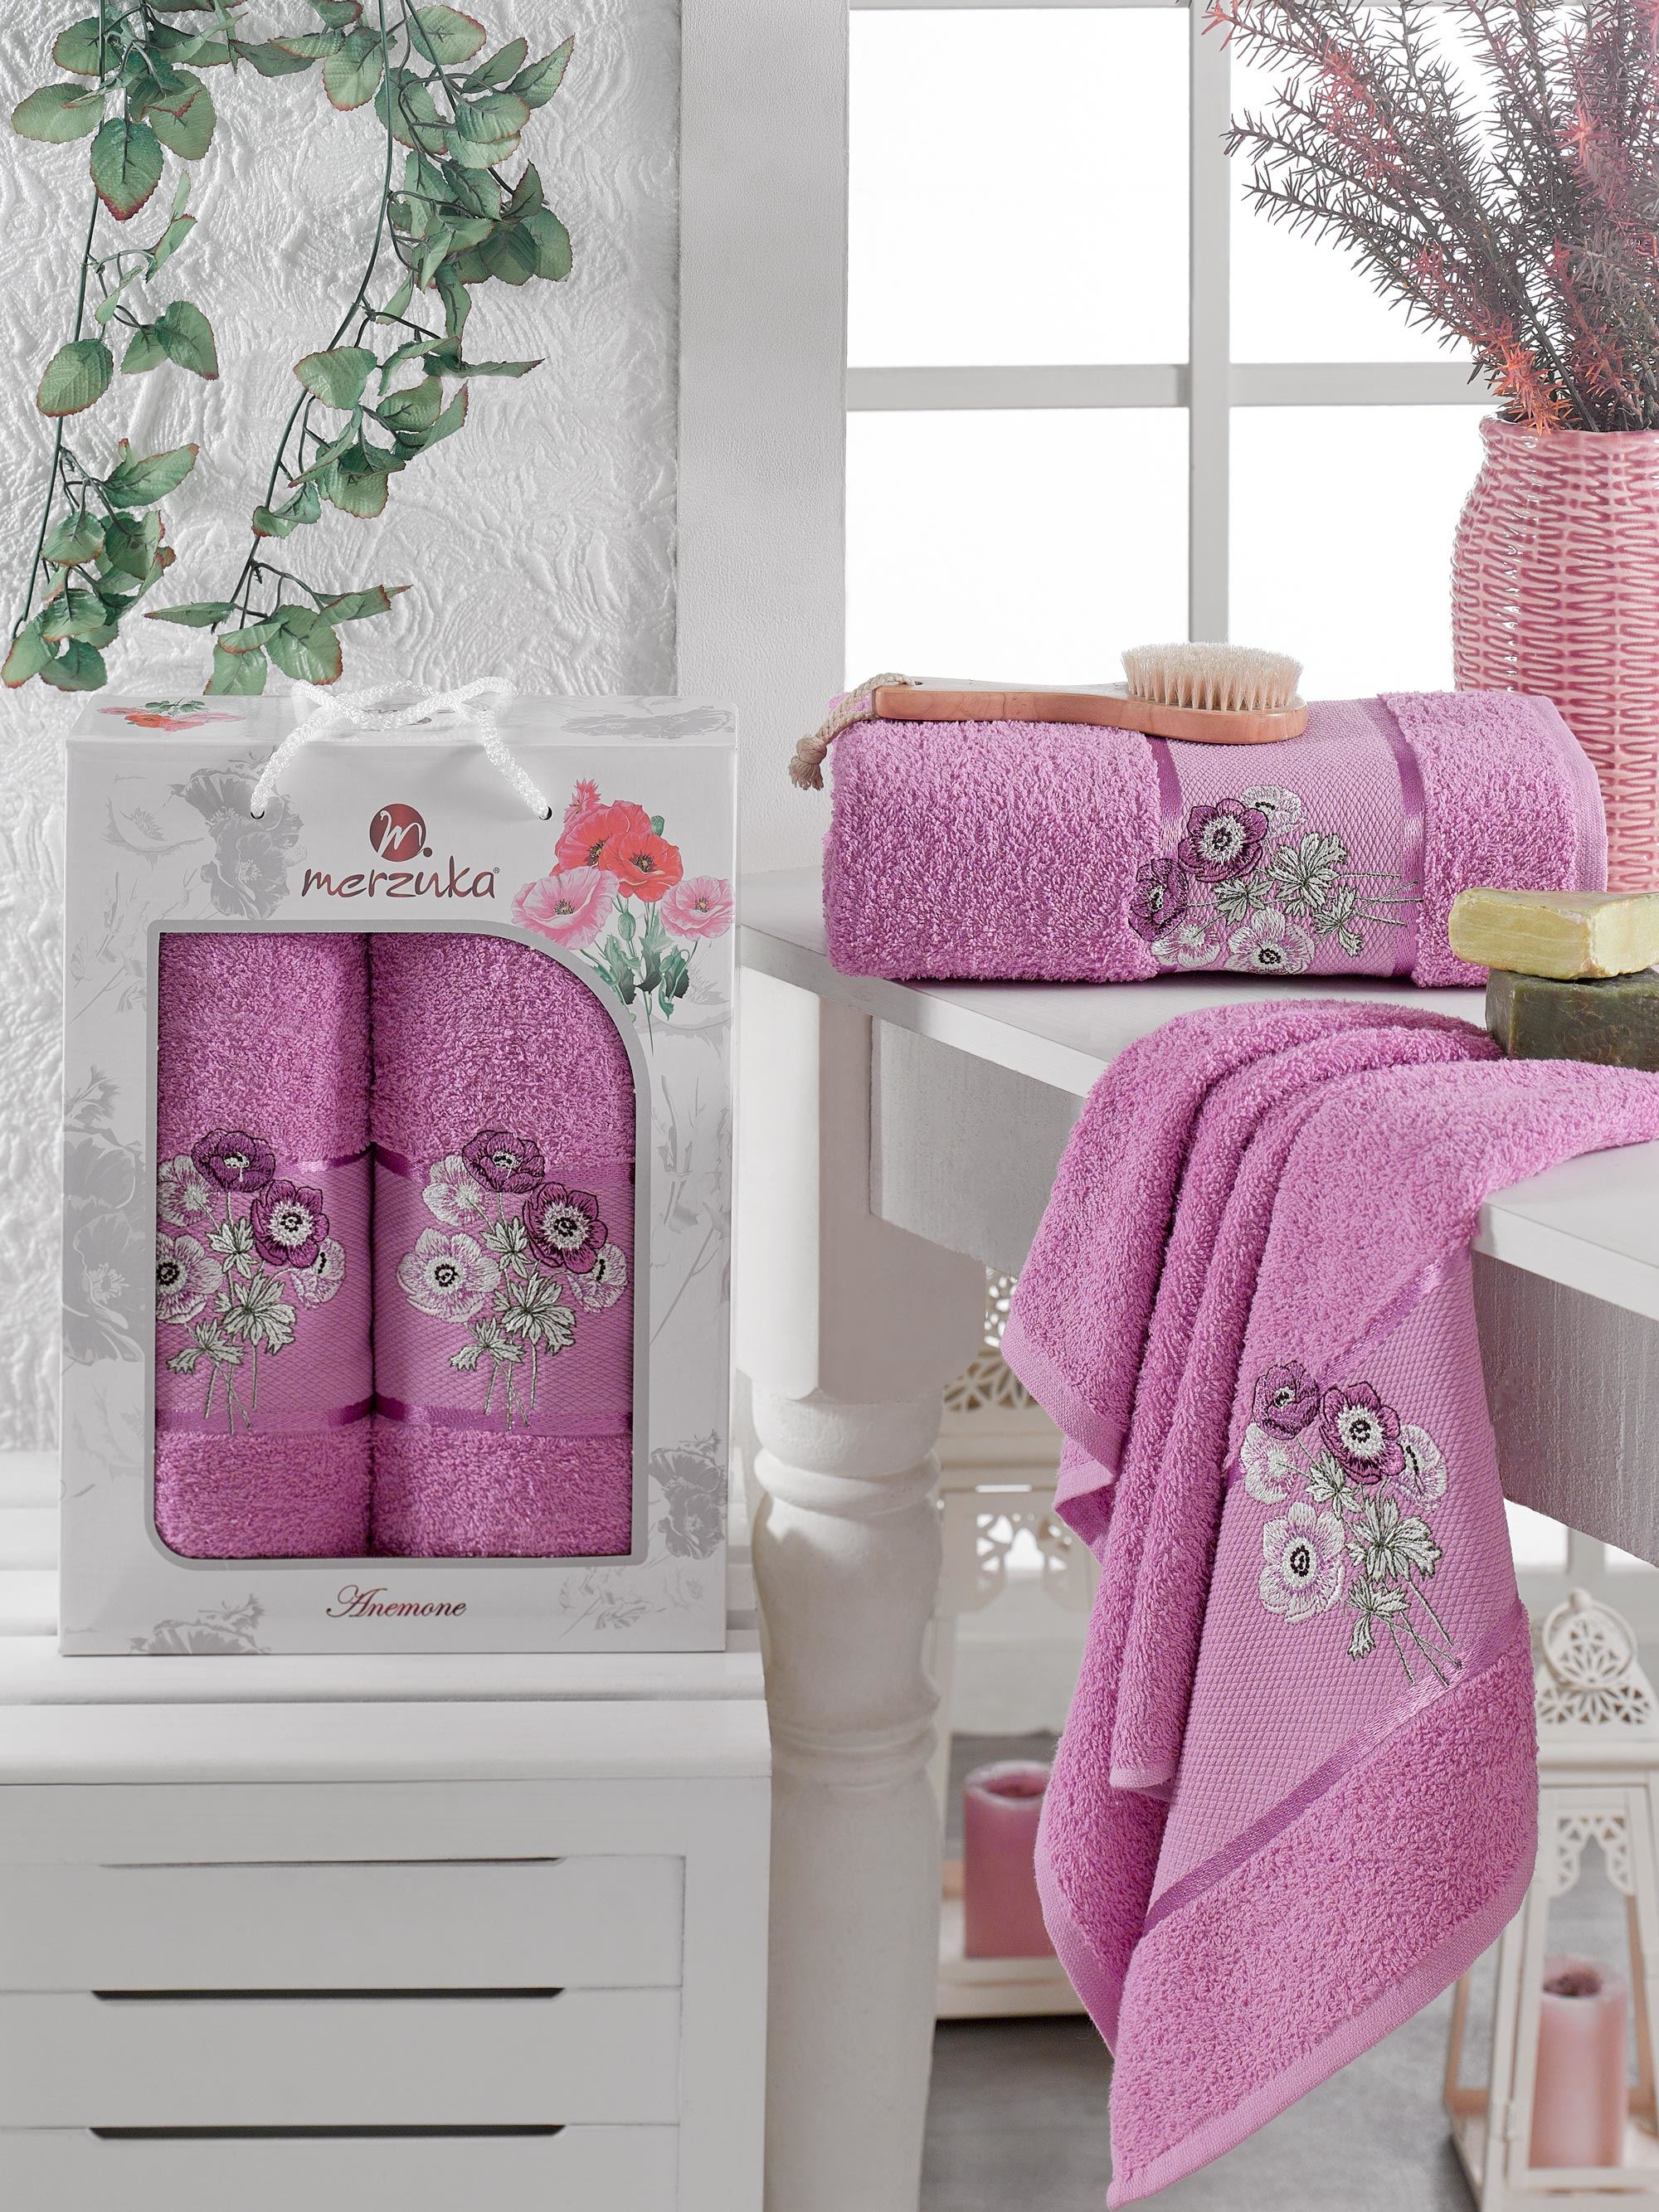 Полотенца Oran Merzuka Полотенце Anemone Цвет: Светло-Лиловый (50х80 см,70х130 см) полотенца oran merzuka полотенце sakura цвет светло лиловый набор